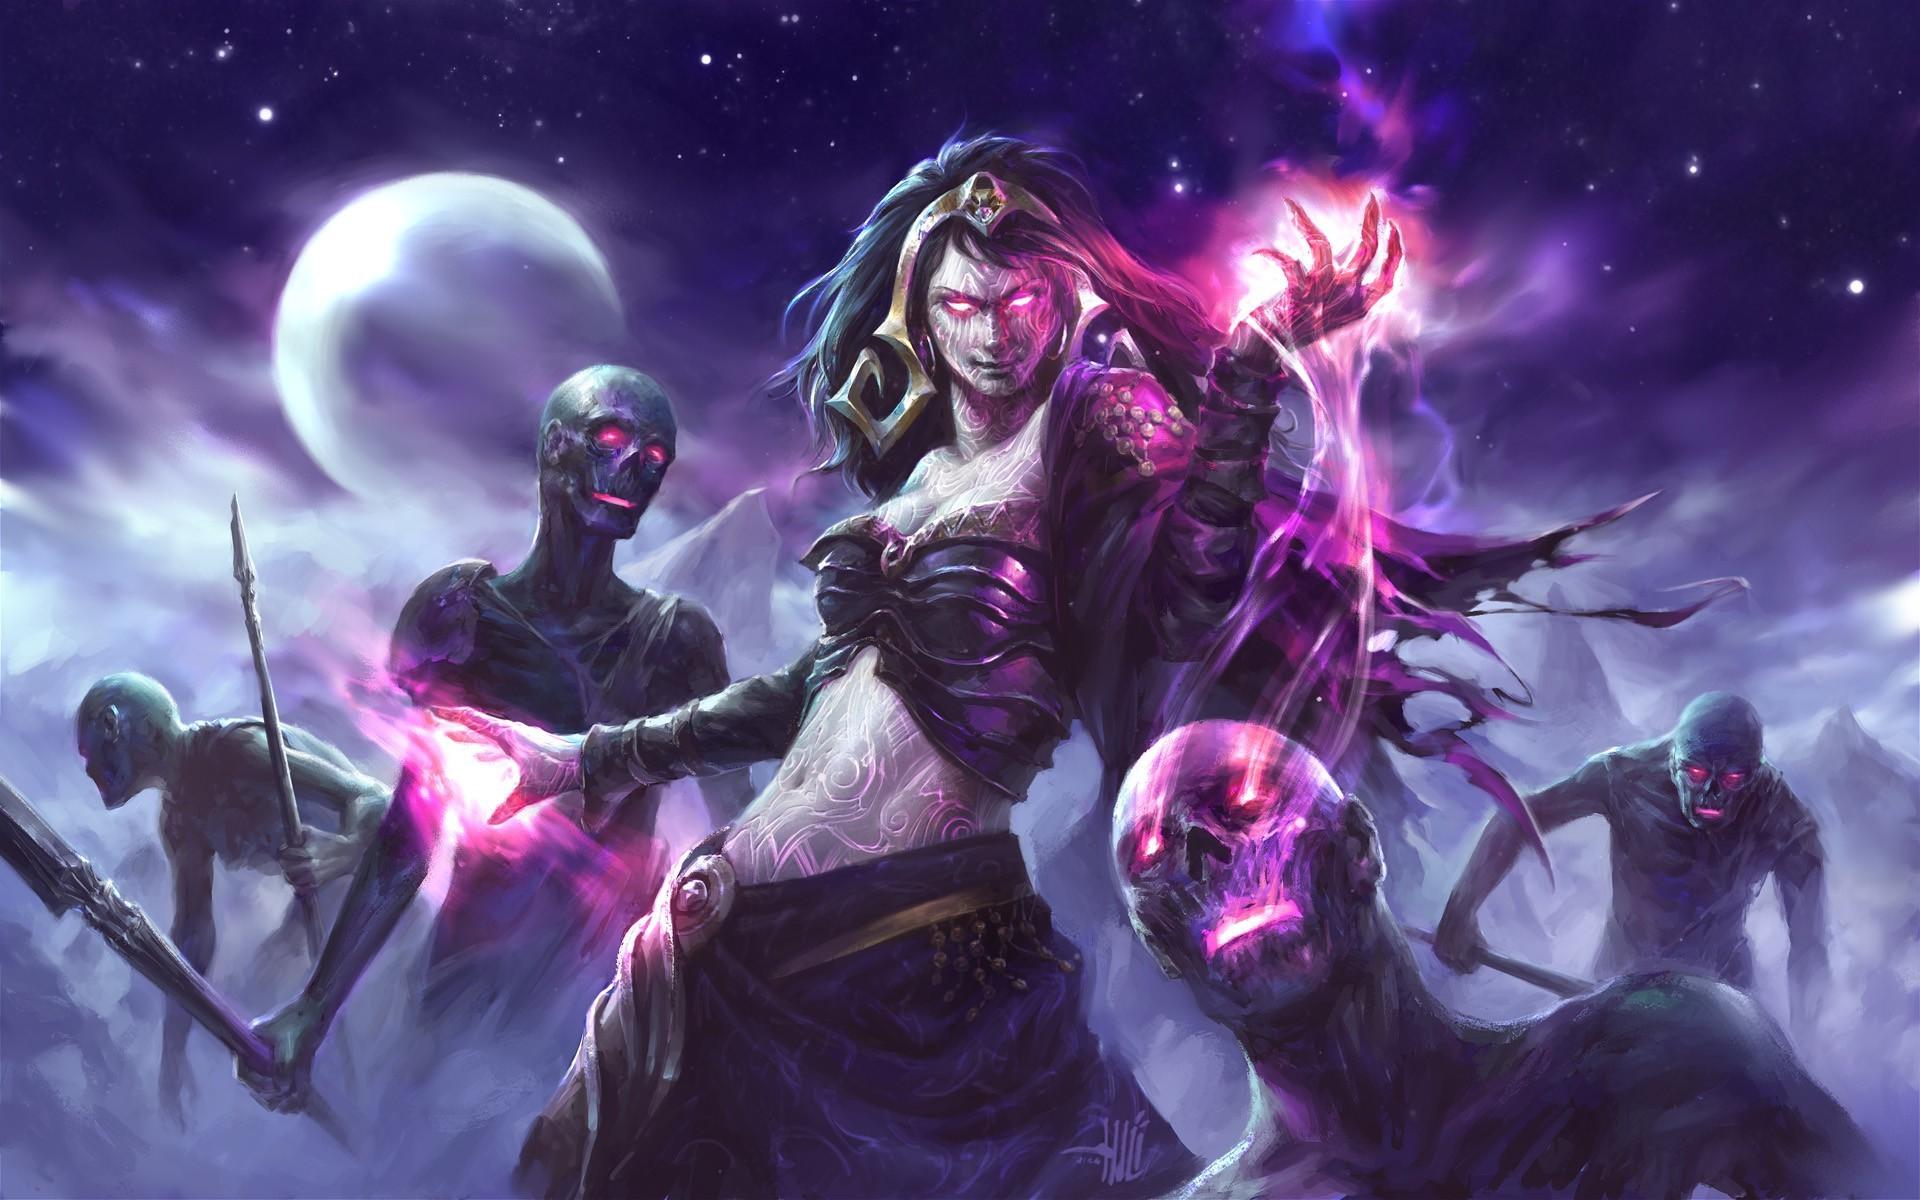 1920x1200 Px Fantasy Art Liliana Vess Magic The Gathering Witch Zombies